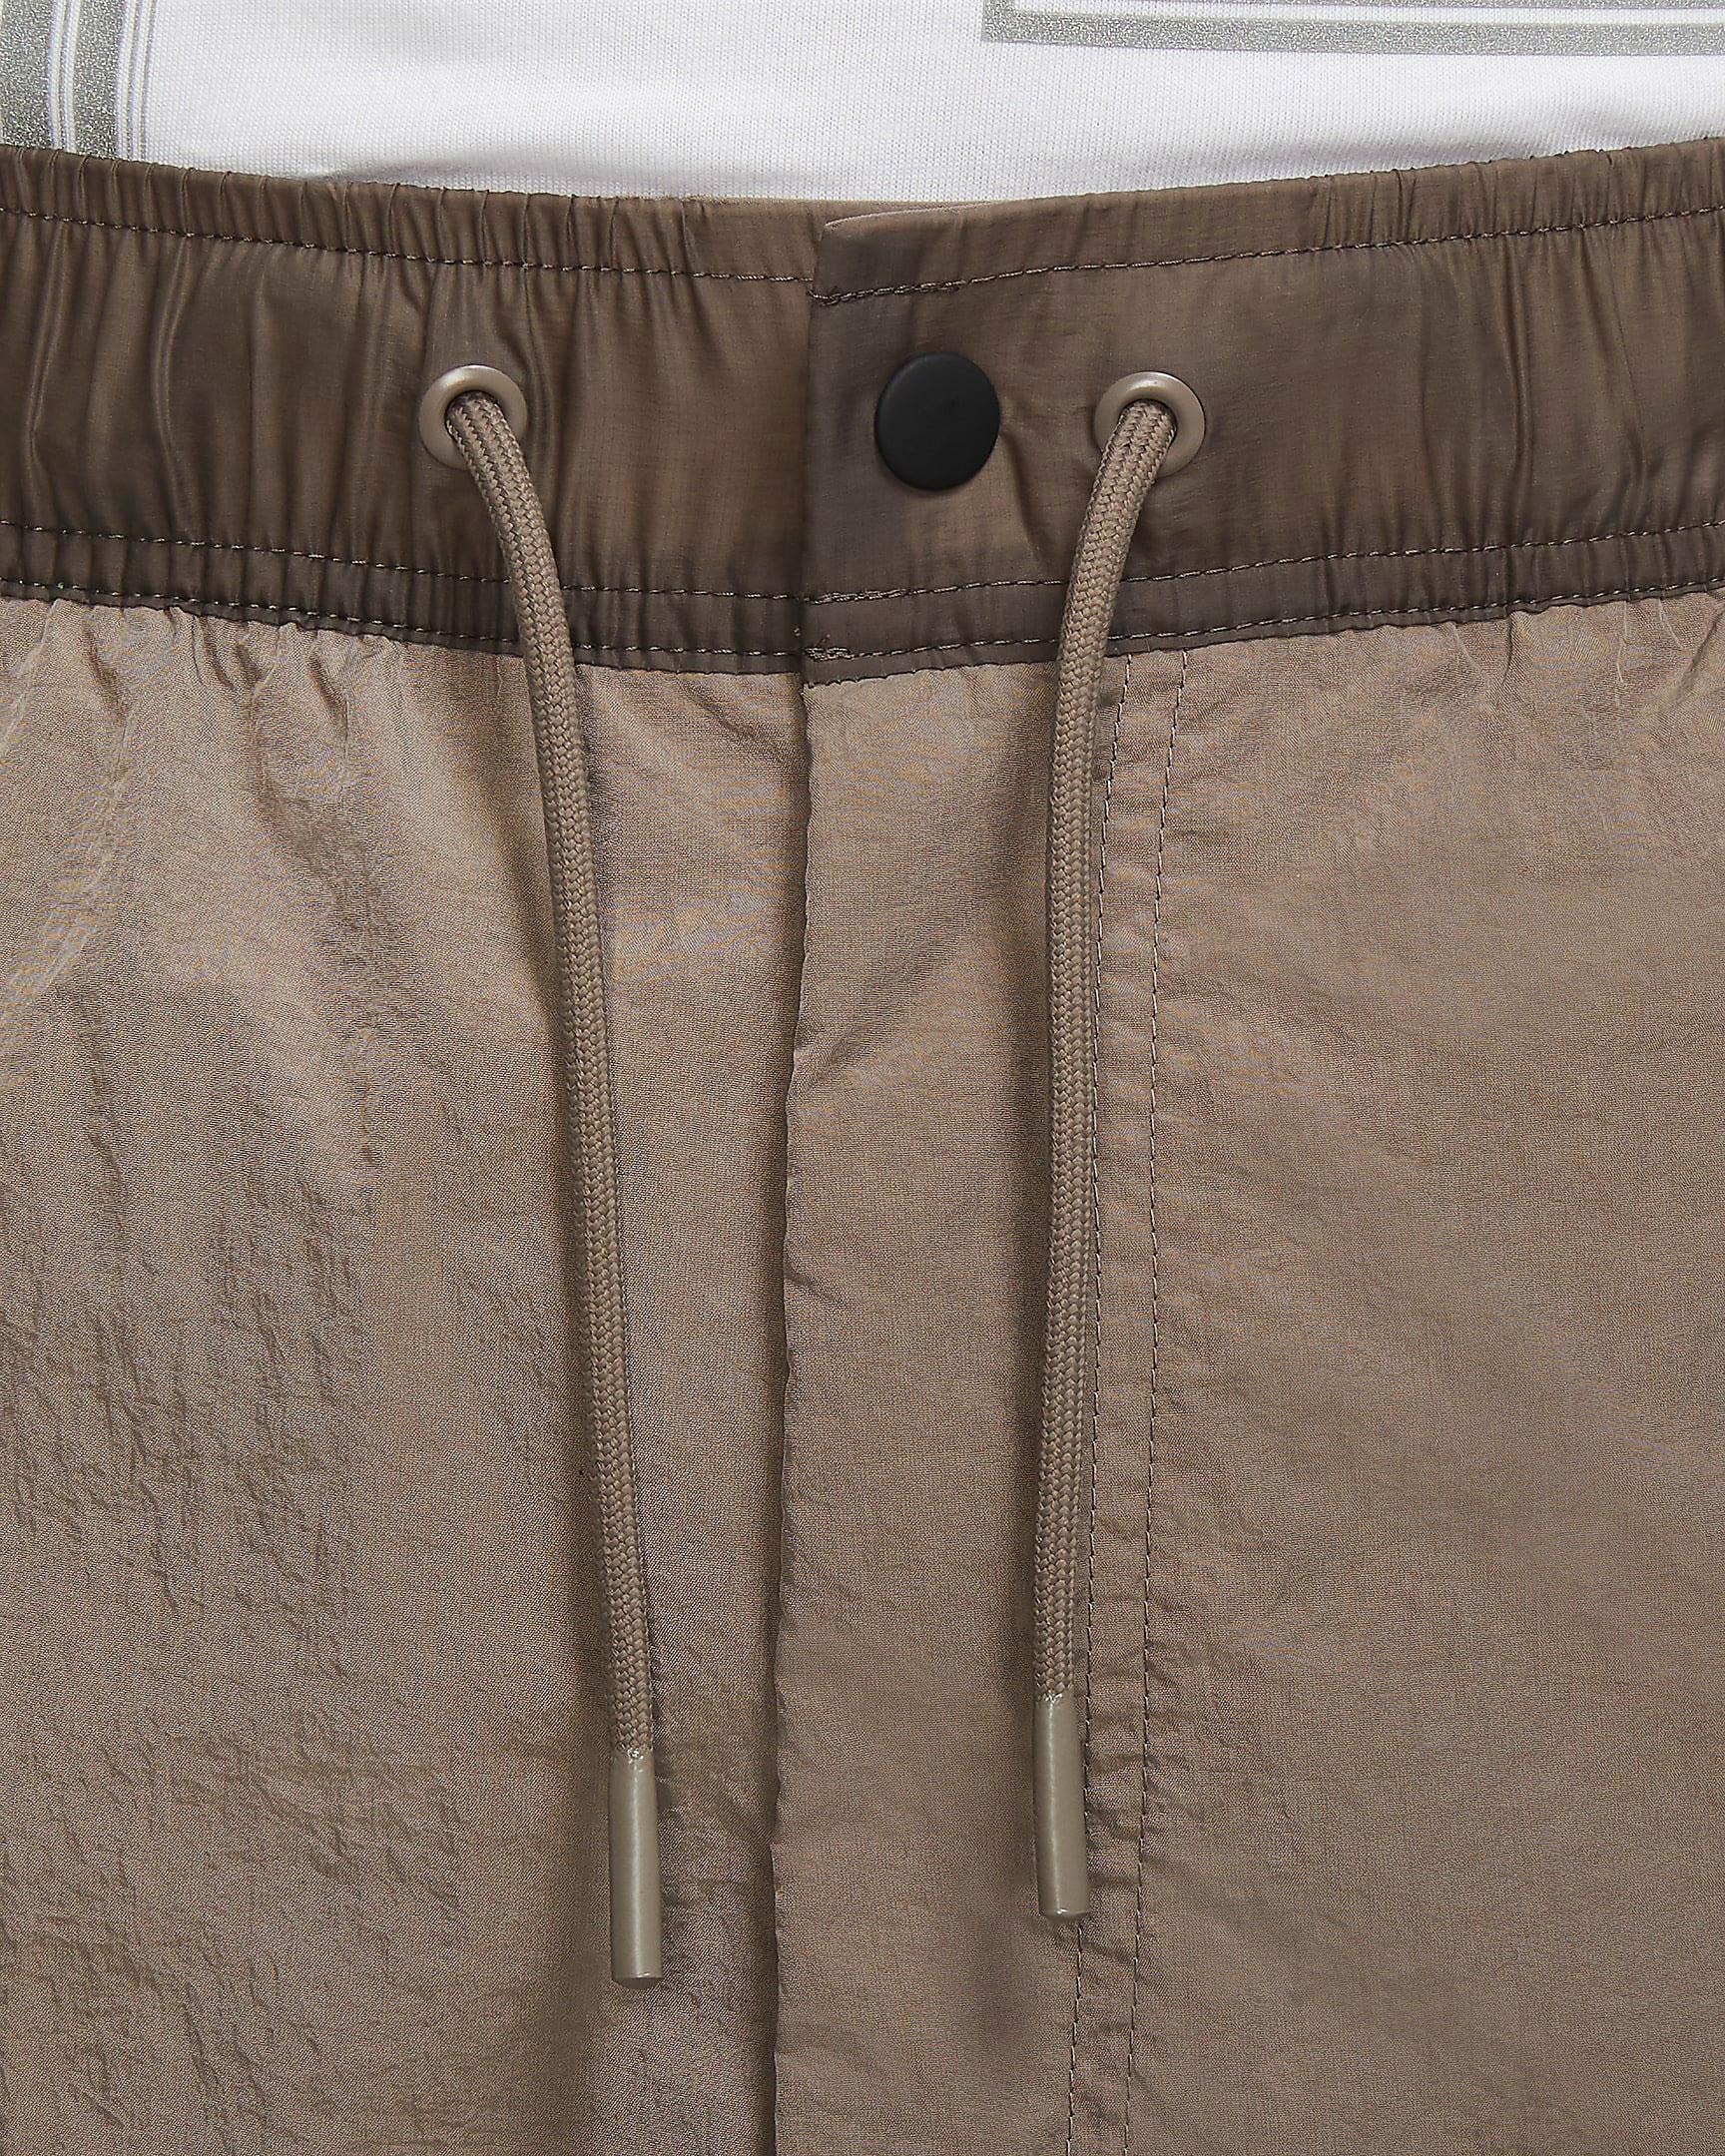 jordan-1-dark-mocha-cargo-pants-match-4